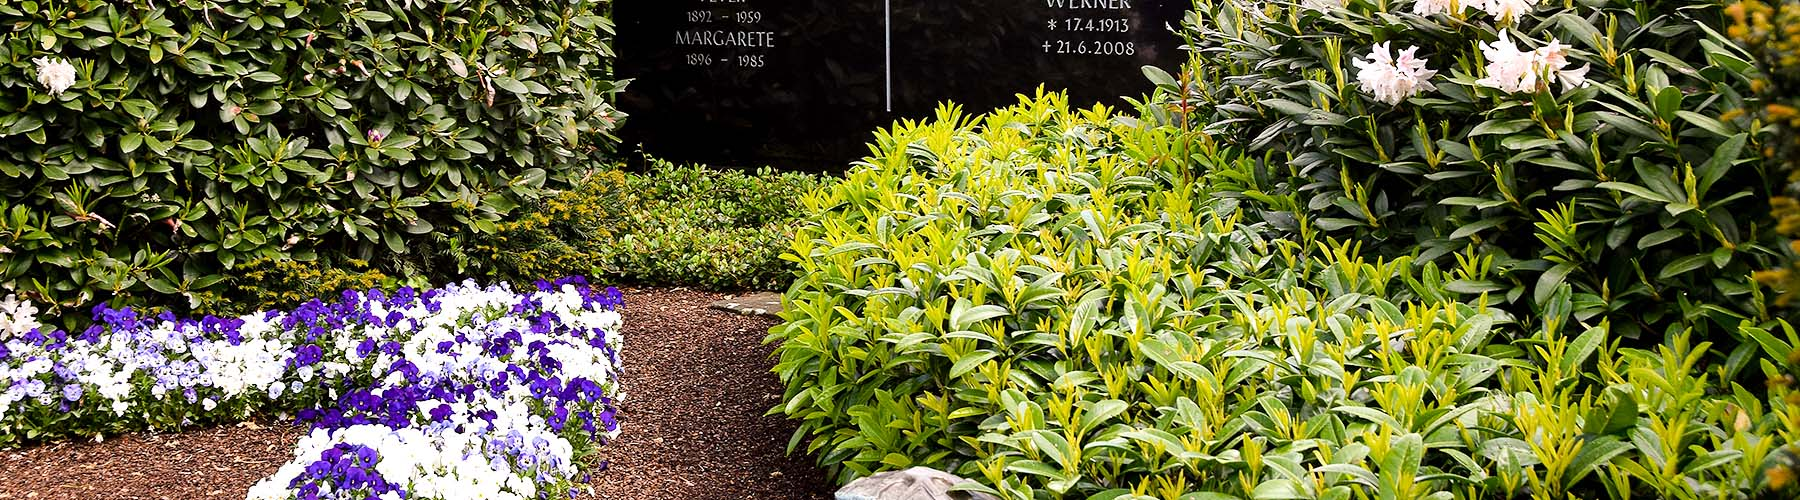 Friedhofsgaertnerei Grabgestaltung Dauergrabpflege Grabpflege